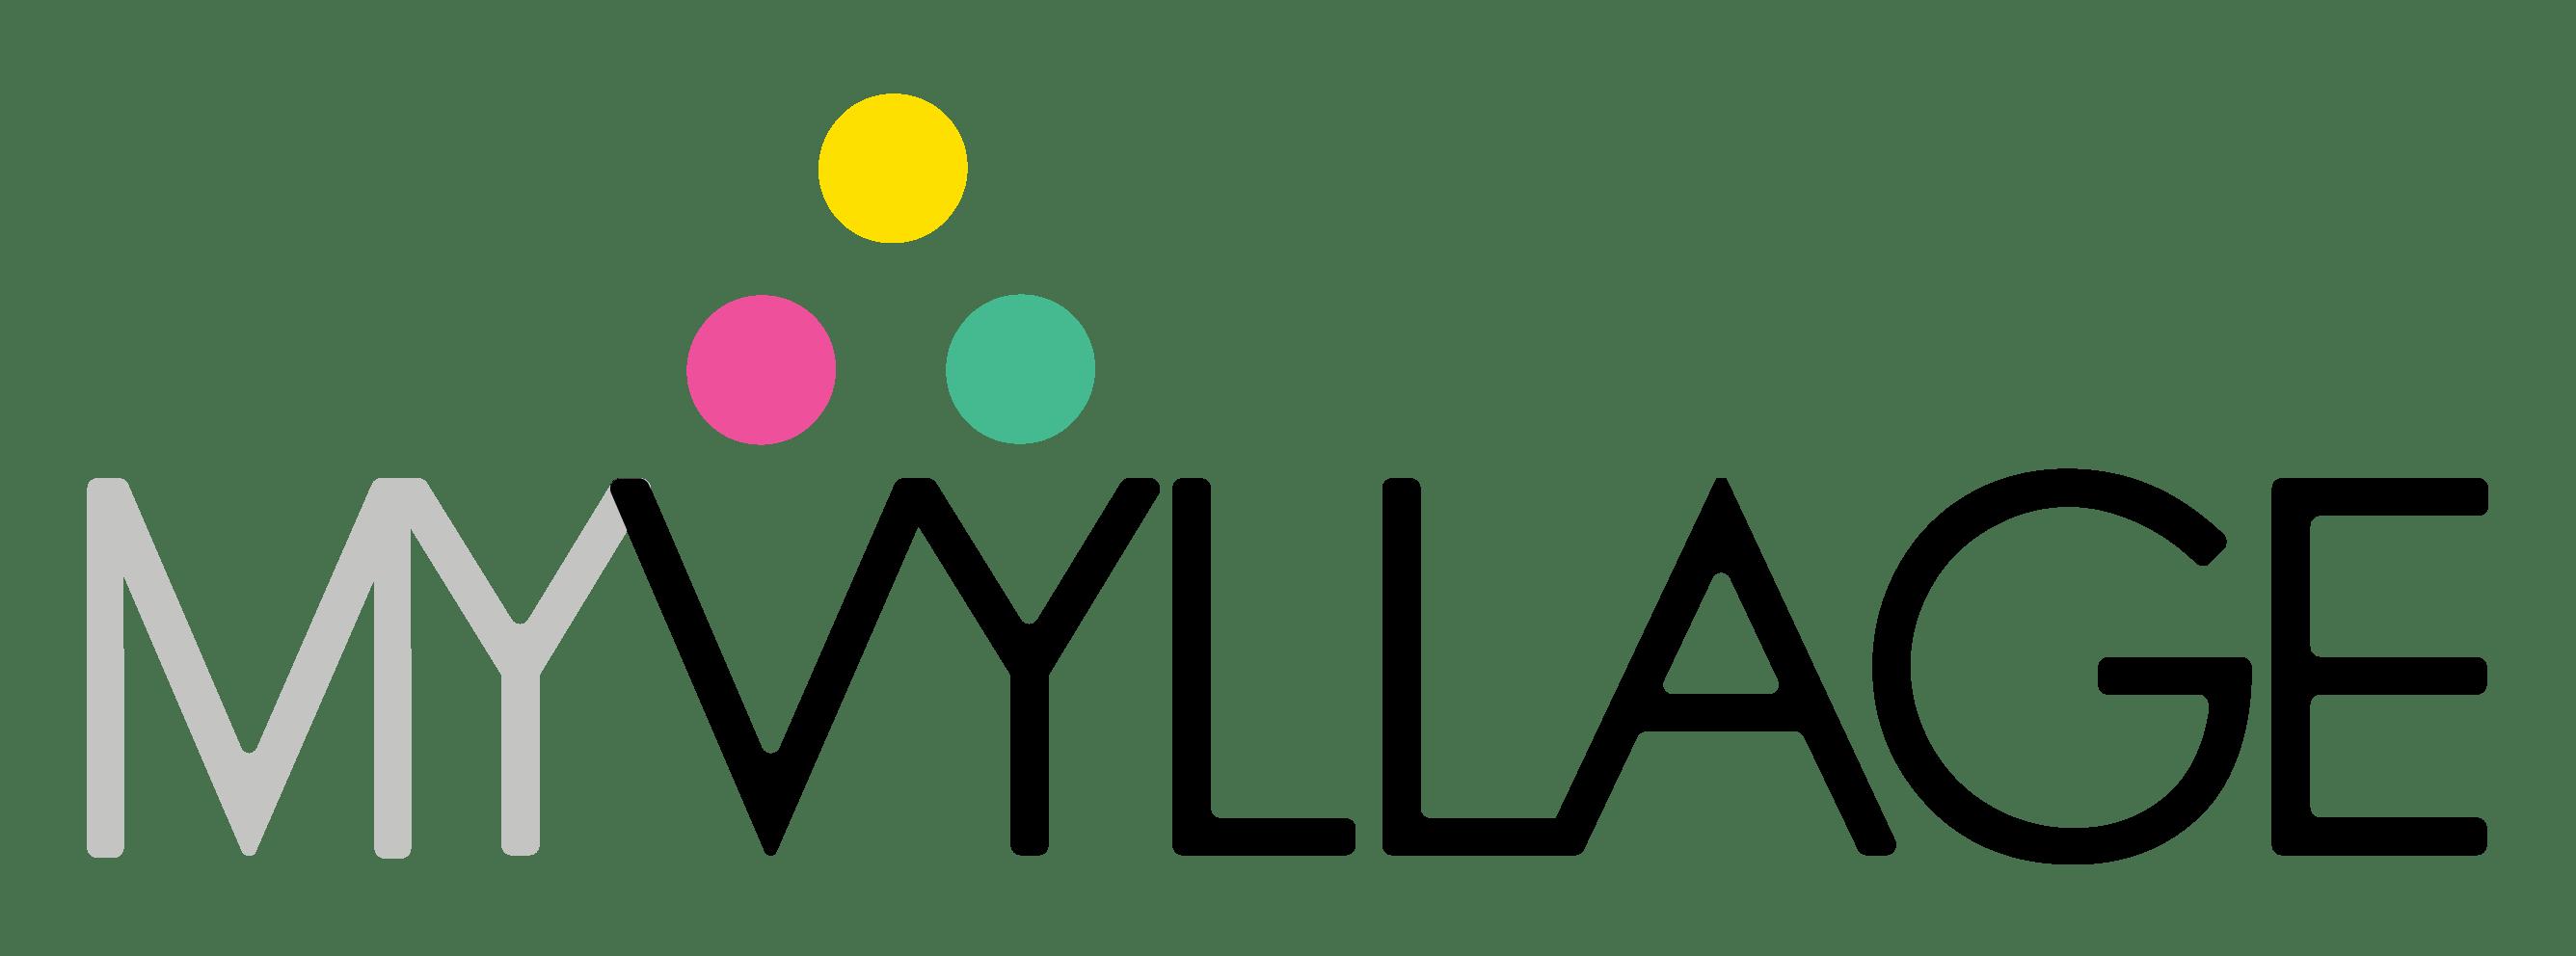 MyVyllage company logo